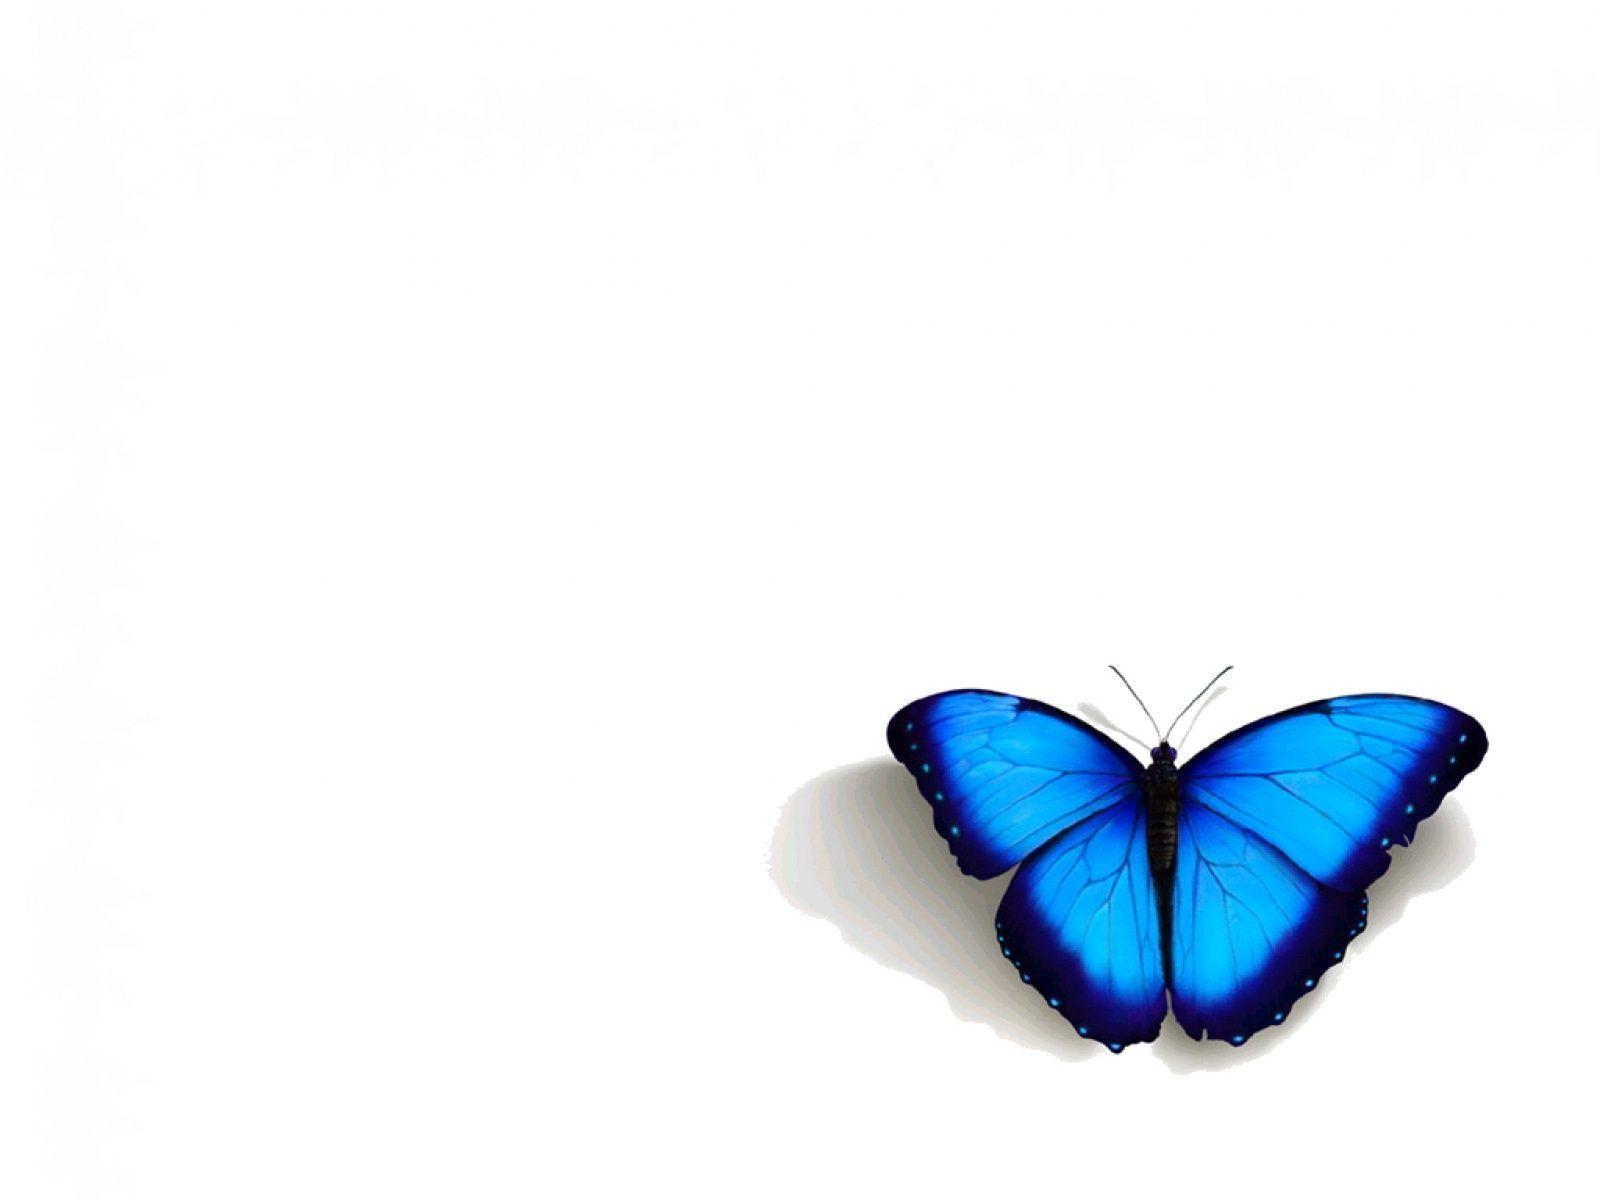 Blue Butterfly Wallpapers Top Free Blue Butterfly